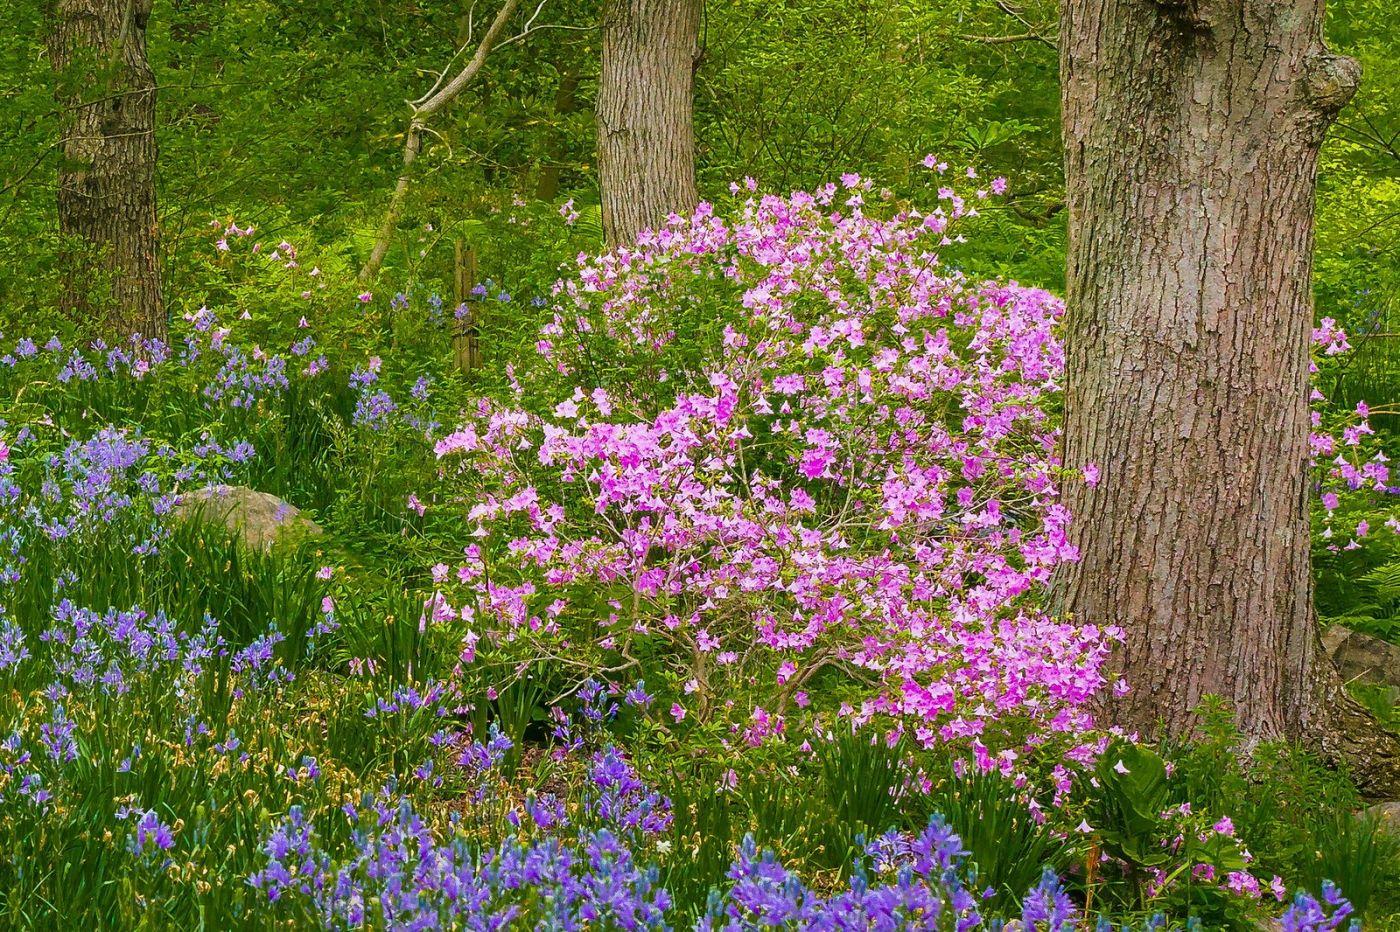 Chanticleer花园,有梦想的季节_图1-36